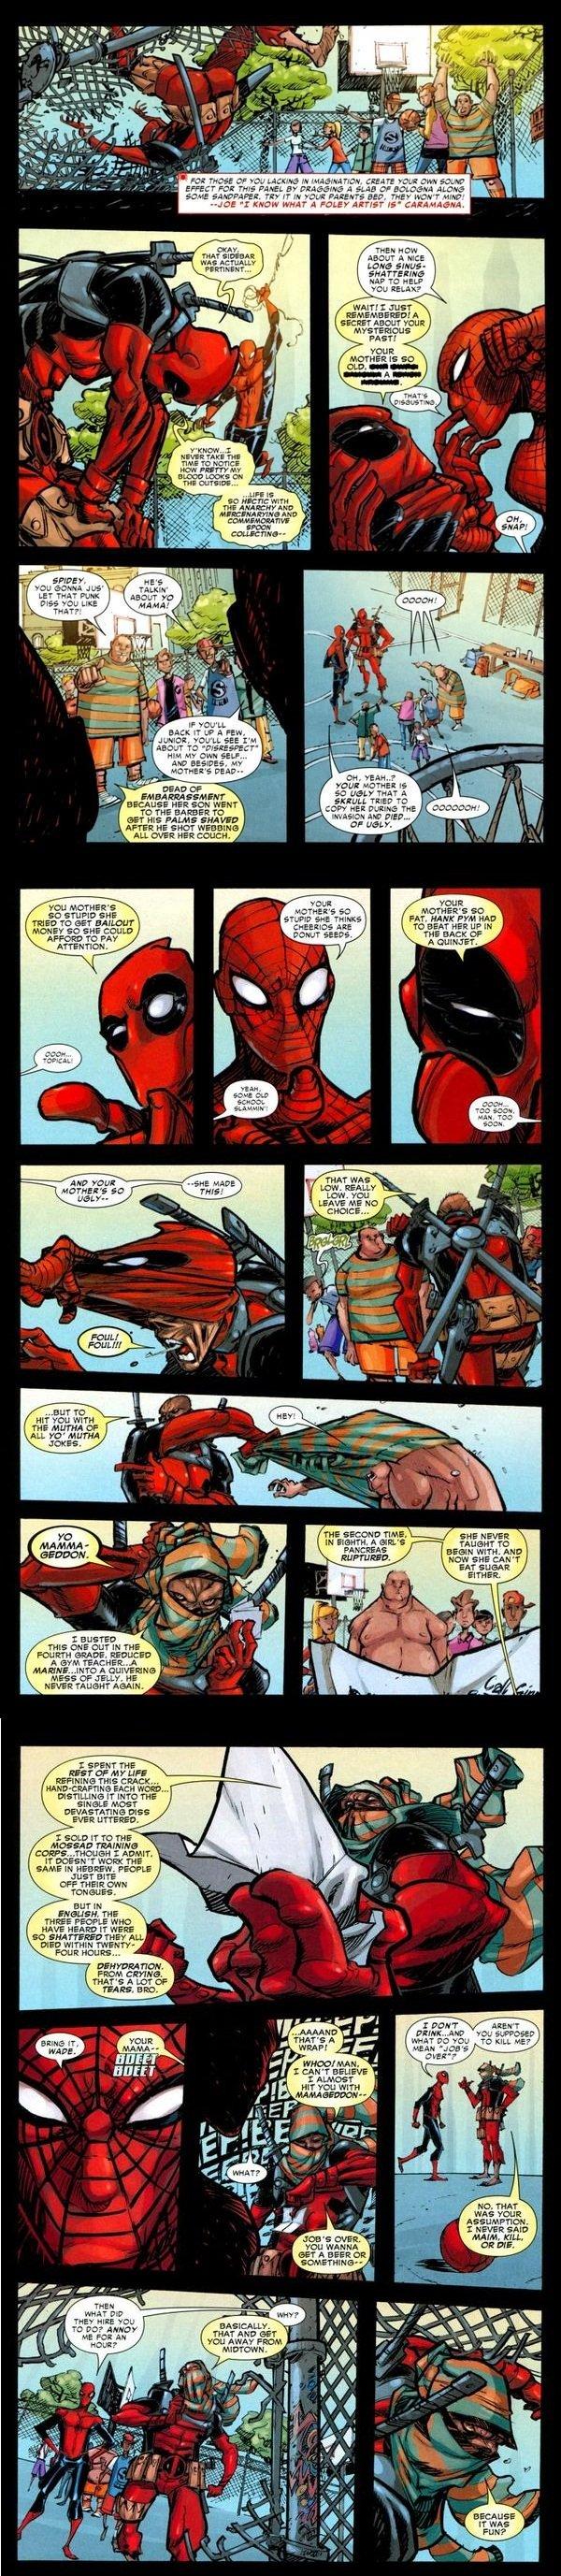 Funnay Ha Ha Spiderman_f56c5b_1656052